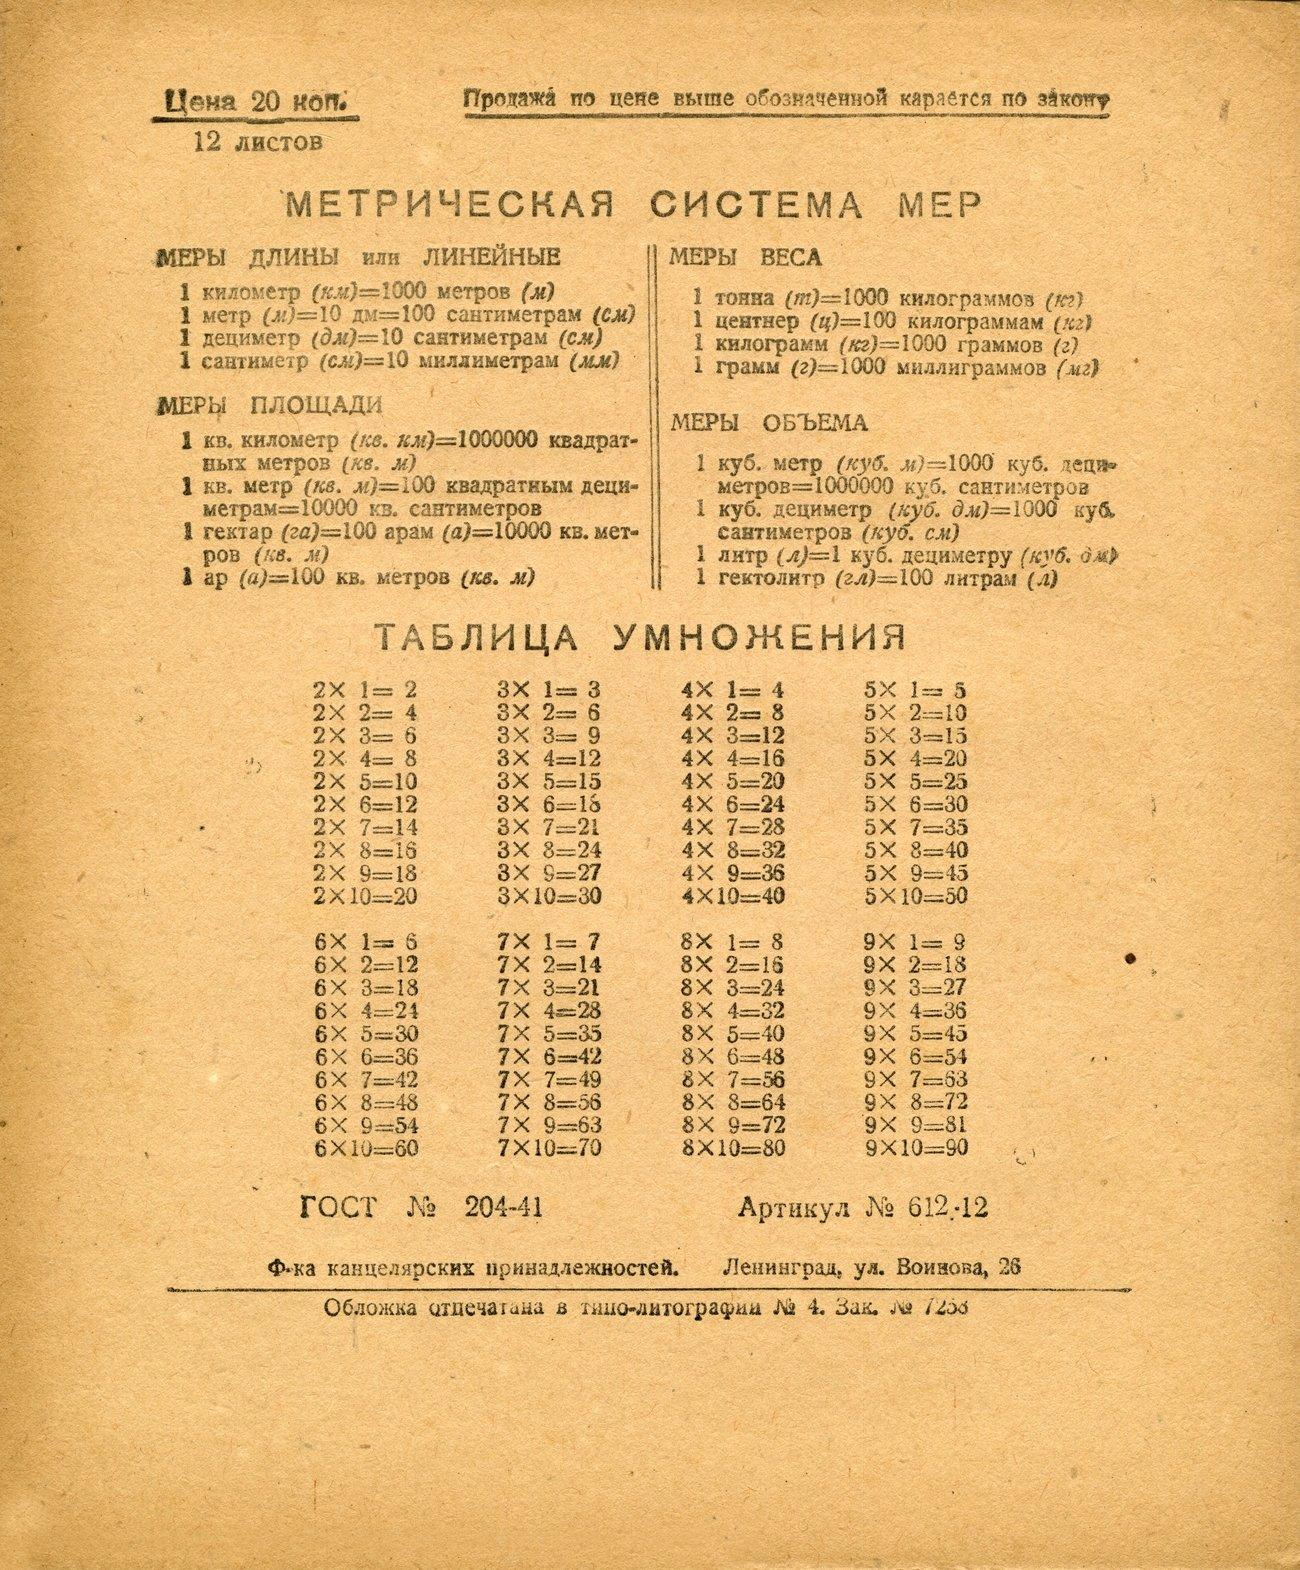 Тетрадь СССР 31 оборот